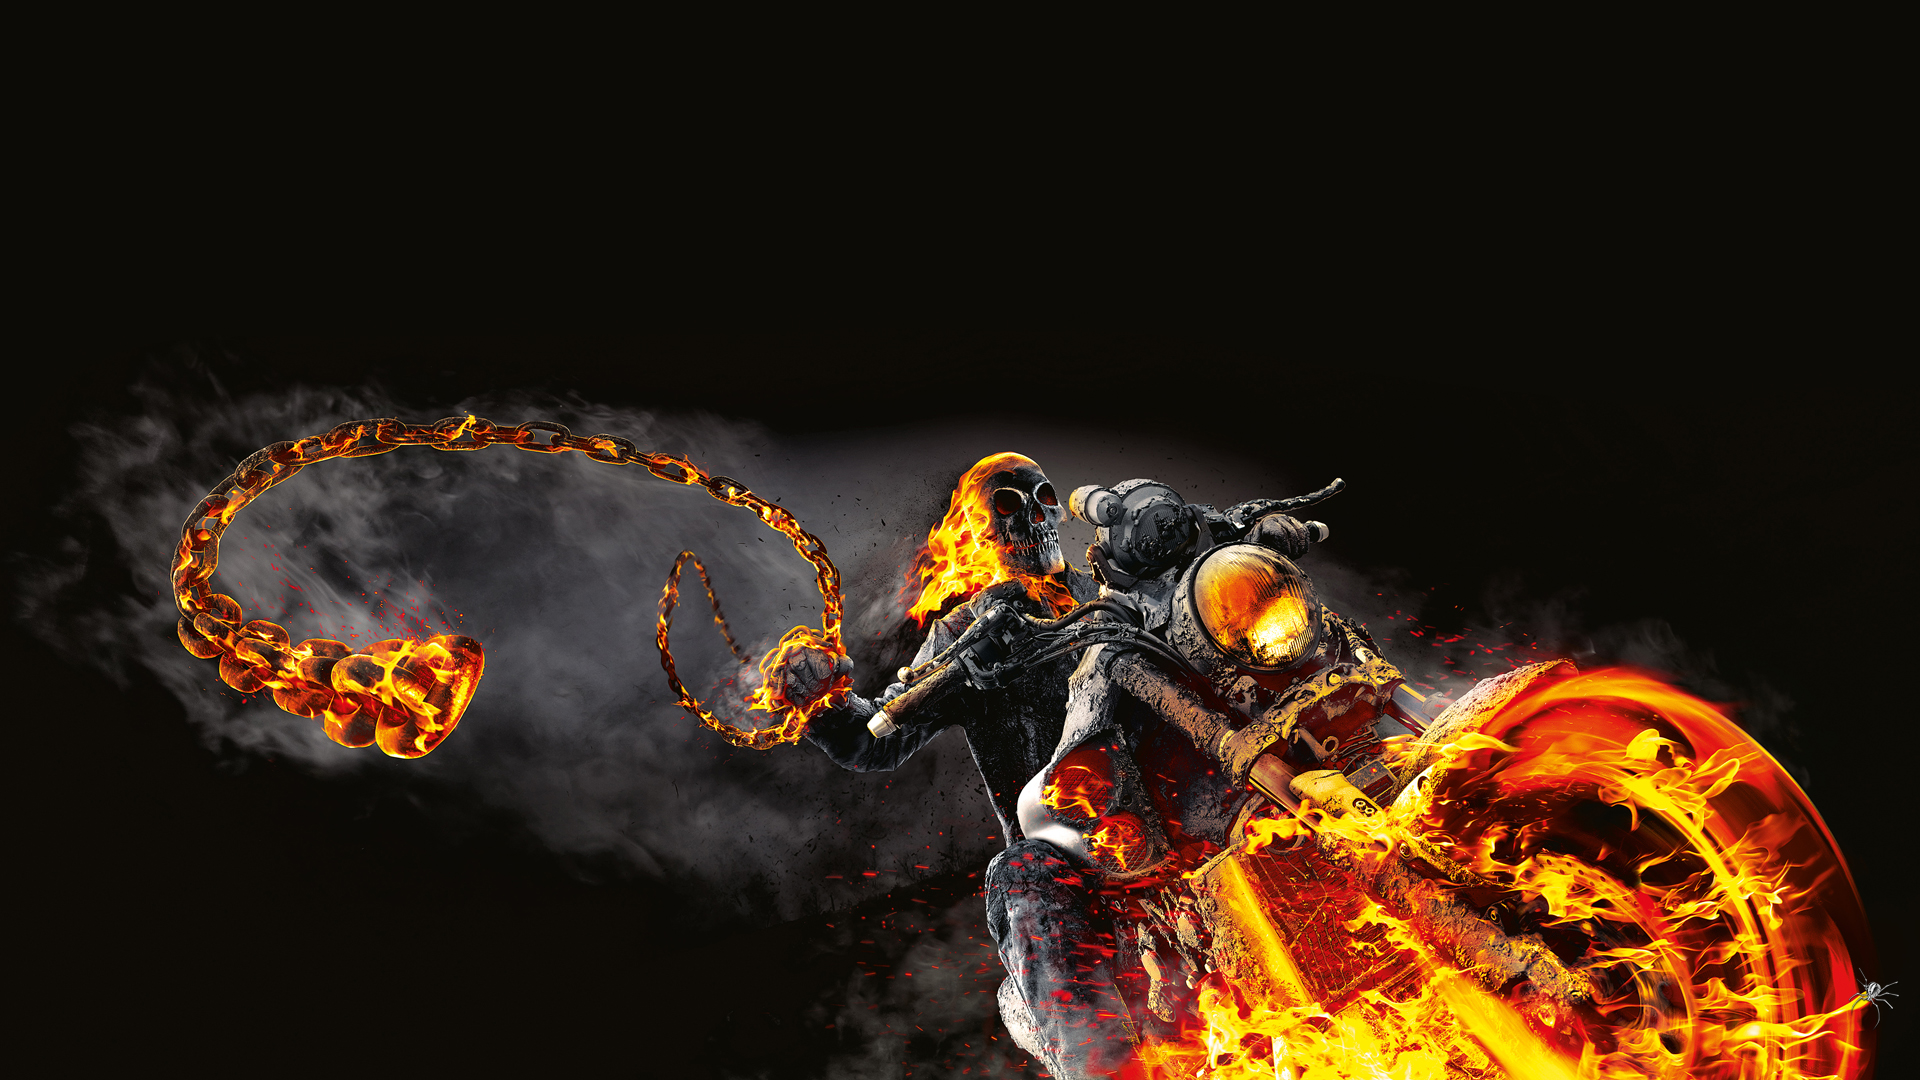 Ghost Rider 2 1920x1080